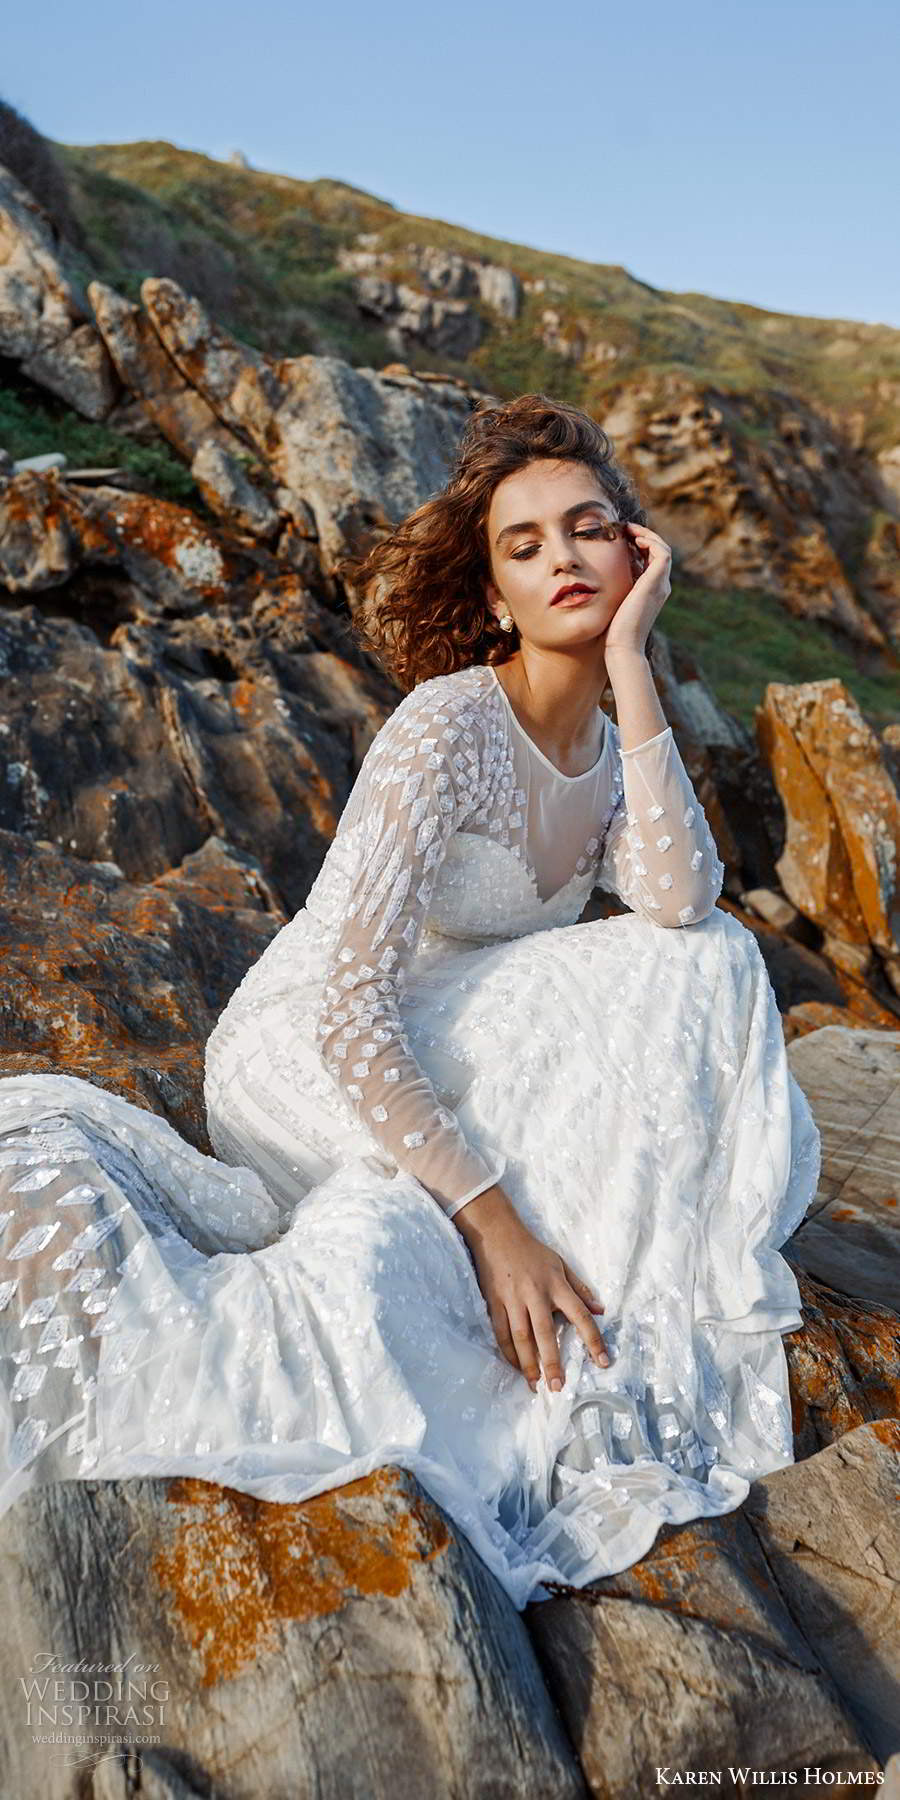 karen willis holmes 2020 bridal illusion long sleeves jewel neckline fully embellished sheath wedding dress chapel train (1) zv